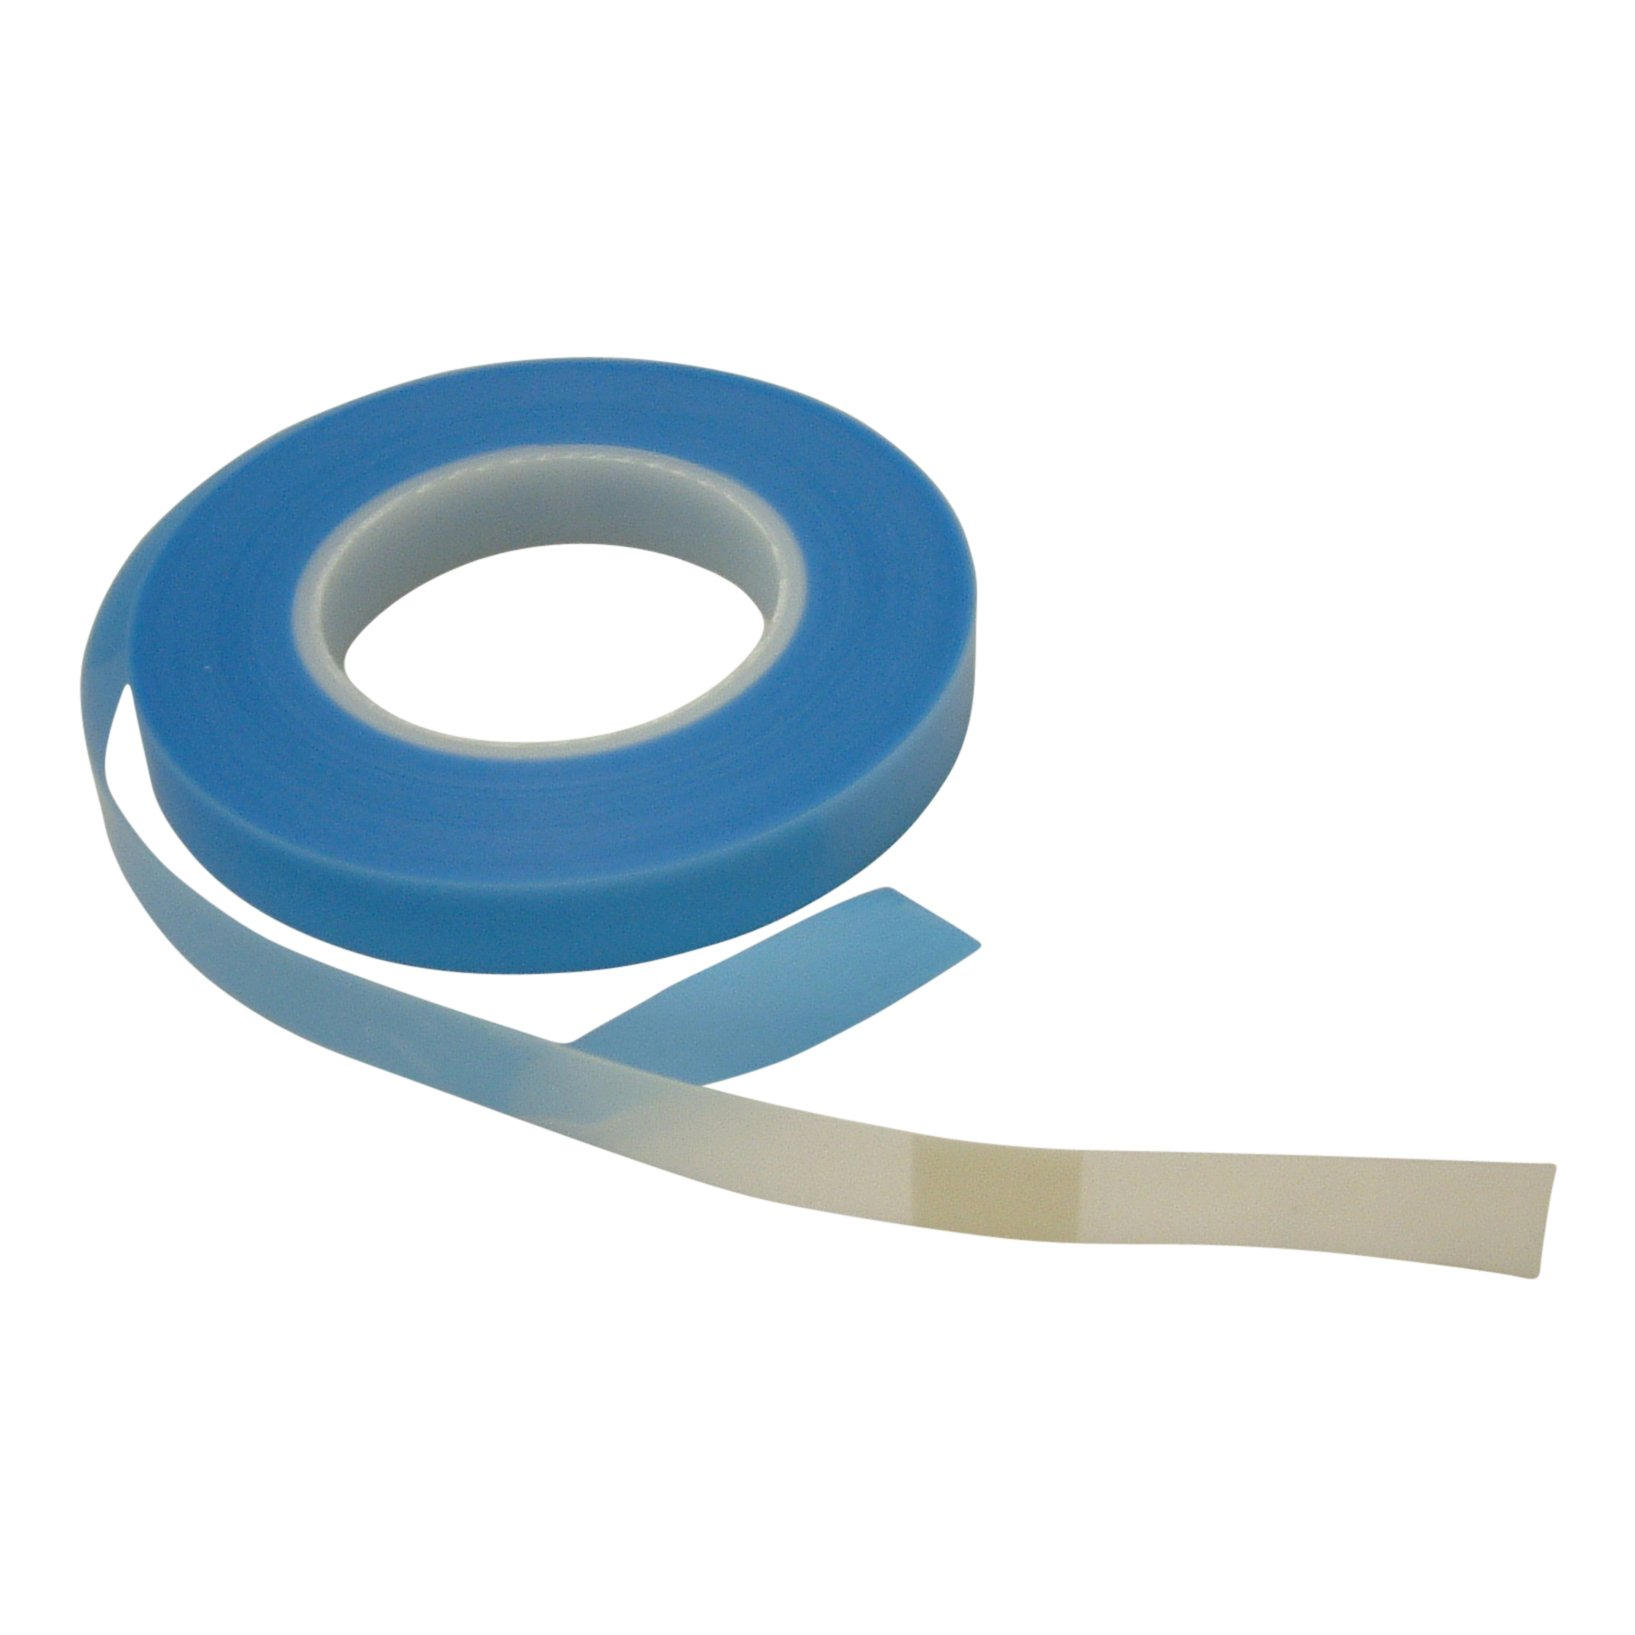 J.V. Converting UHMW-PE-20/NATT07518 JVCC UHMW-PE-20 UHMW Polyethylene Film Tape: 3/4'' x 18 yd., Natural/Translucent